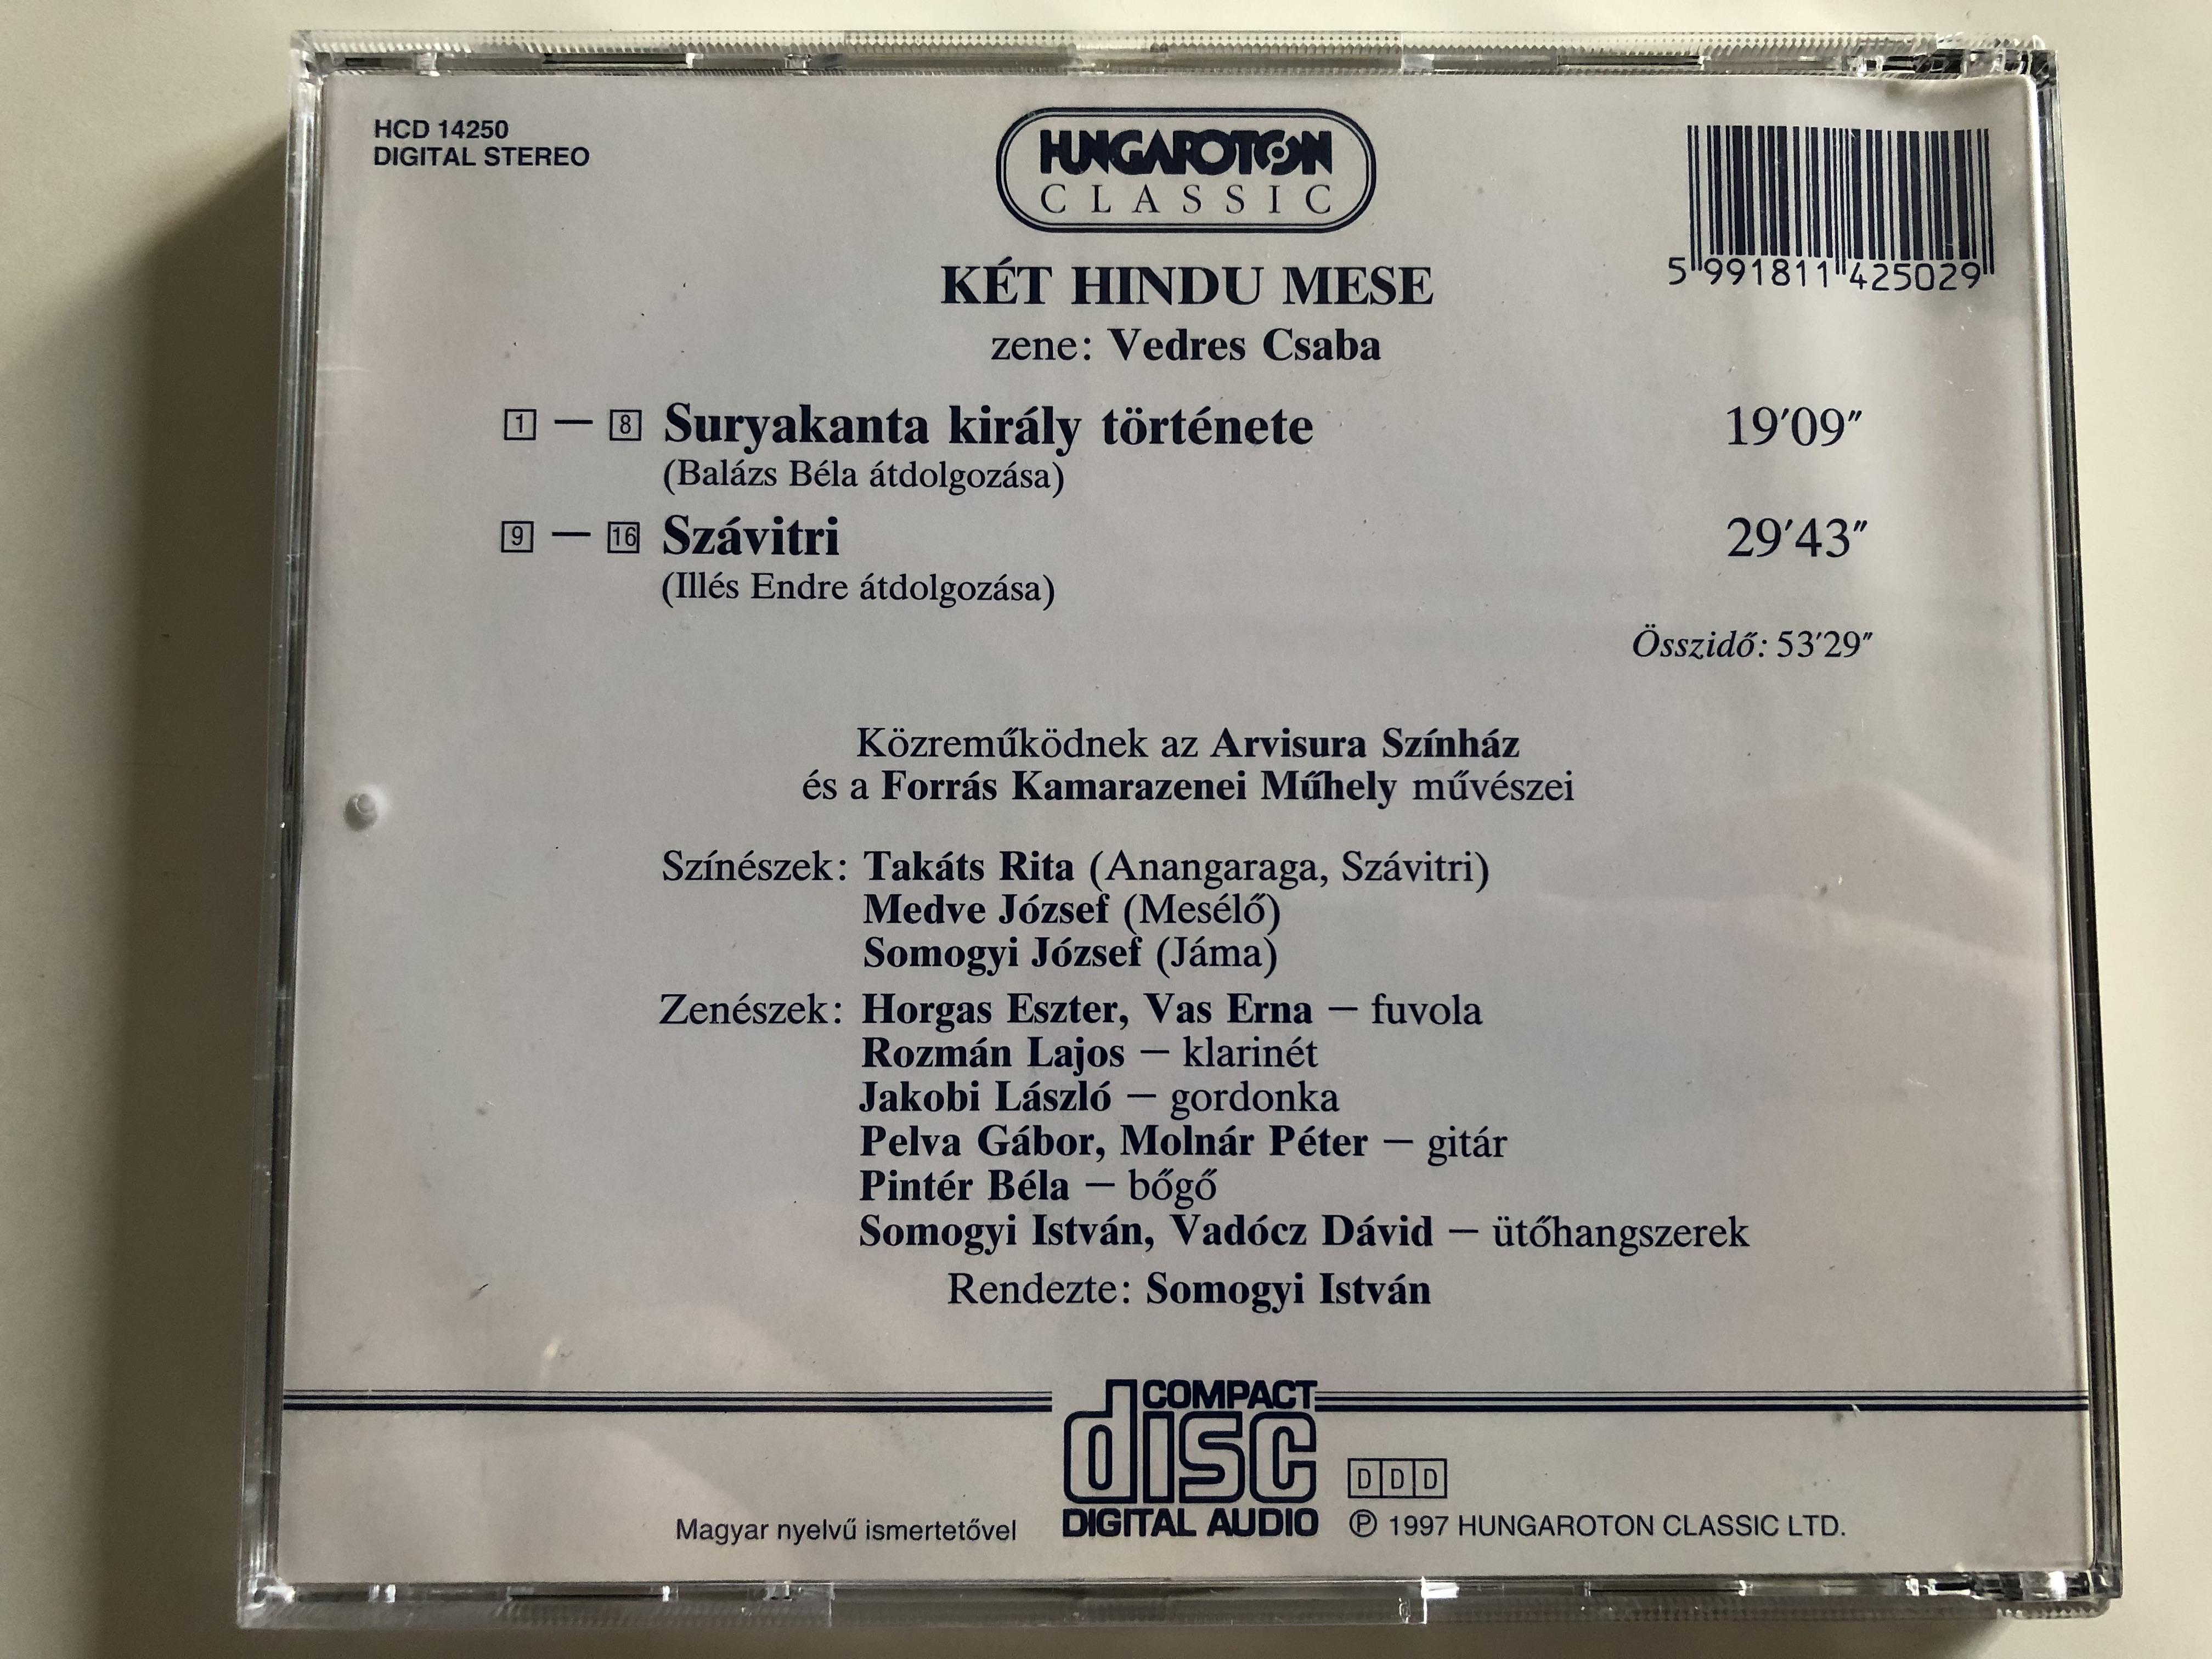 k-t-hindu-mese-suryakanta-kir-ly-t-rt-nete-sz-vitri-arvisura-sz-nh-z-forr-s-kamarazenei-m-hely-hungaroton-classic-audio-cd-1997-hcd-14250-9-.jpg